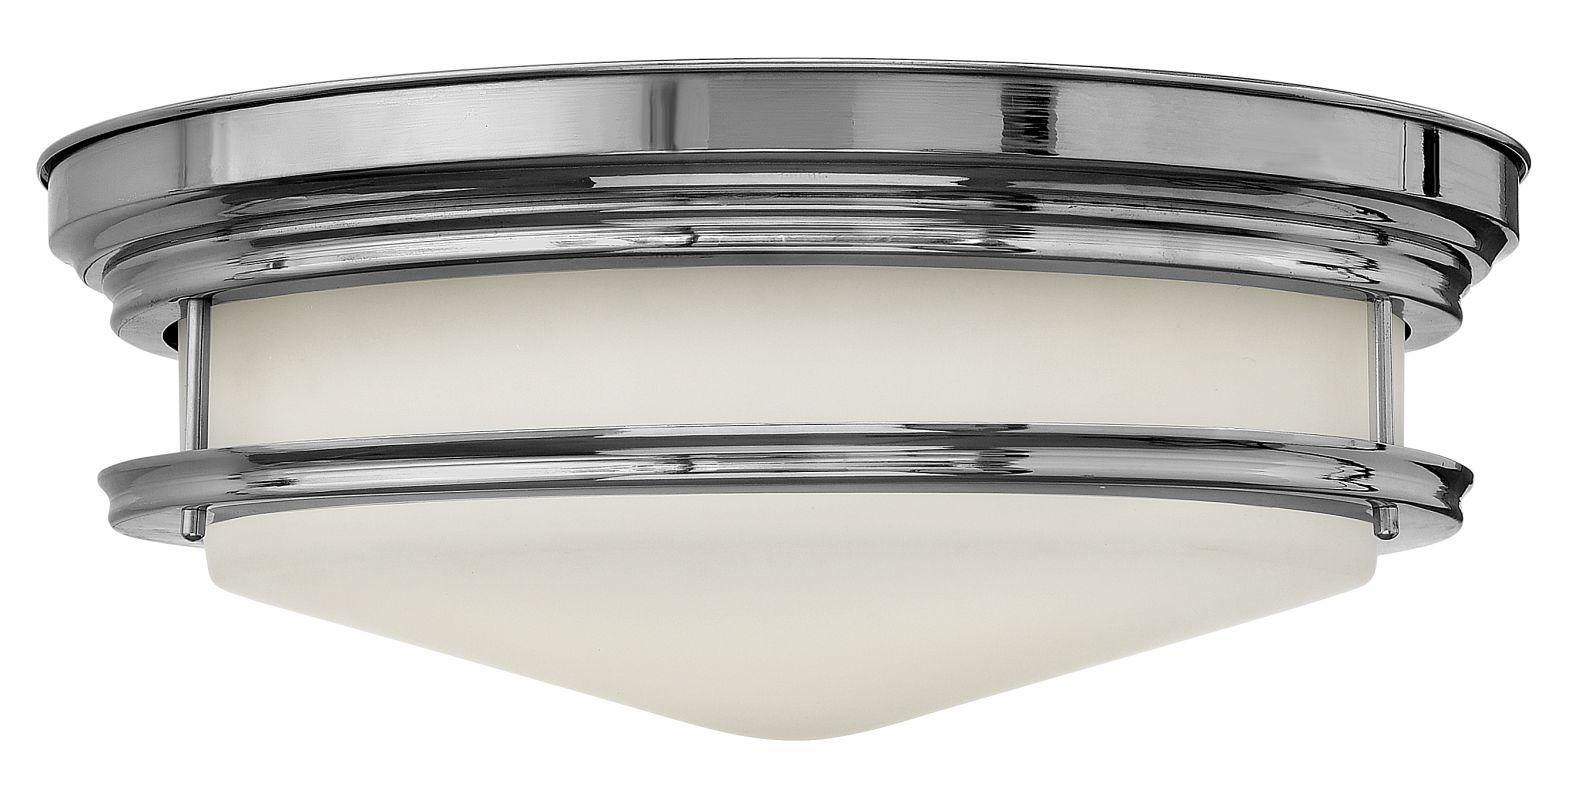 Hinkley Lighting 3304 4 Light Indoor Flush Mount Ceiling Fixture from